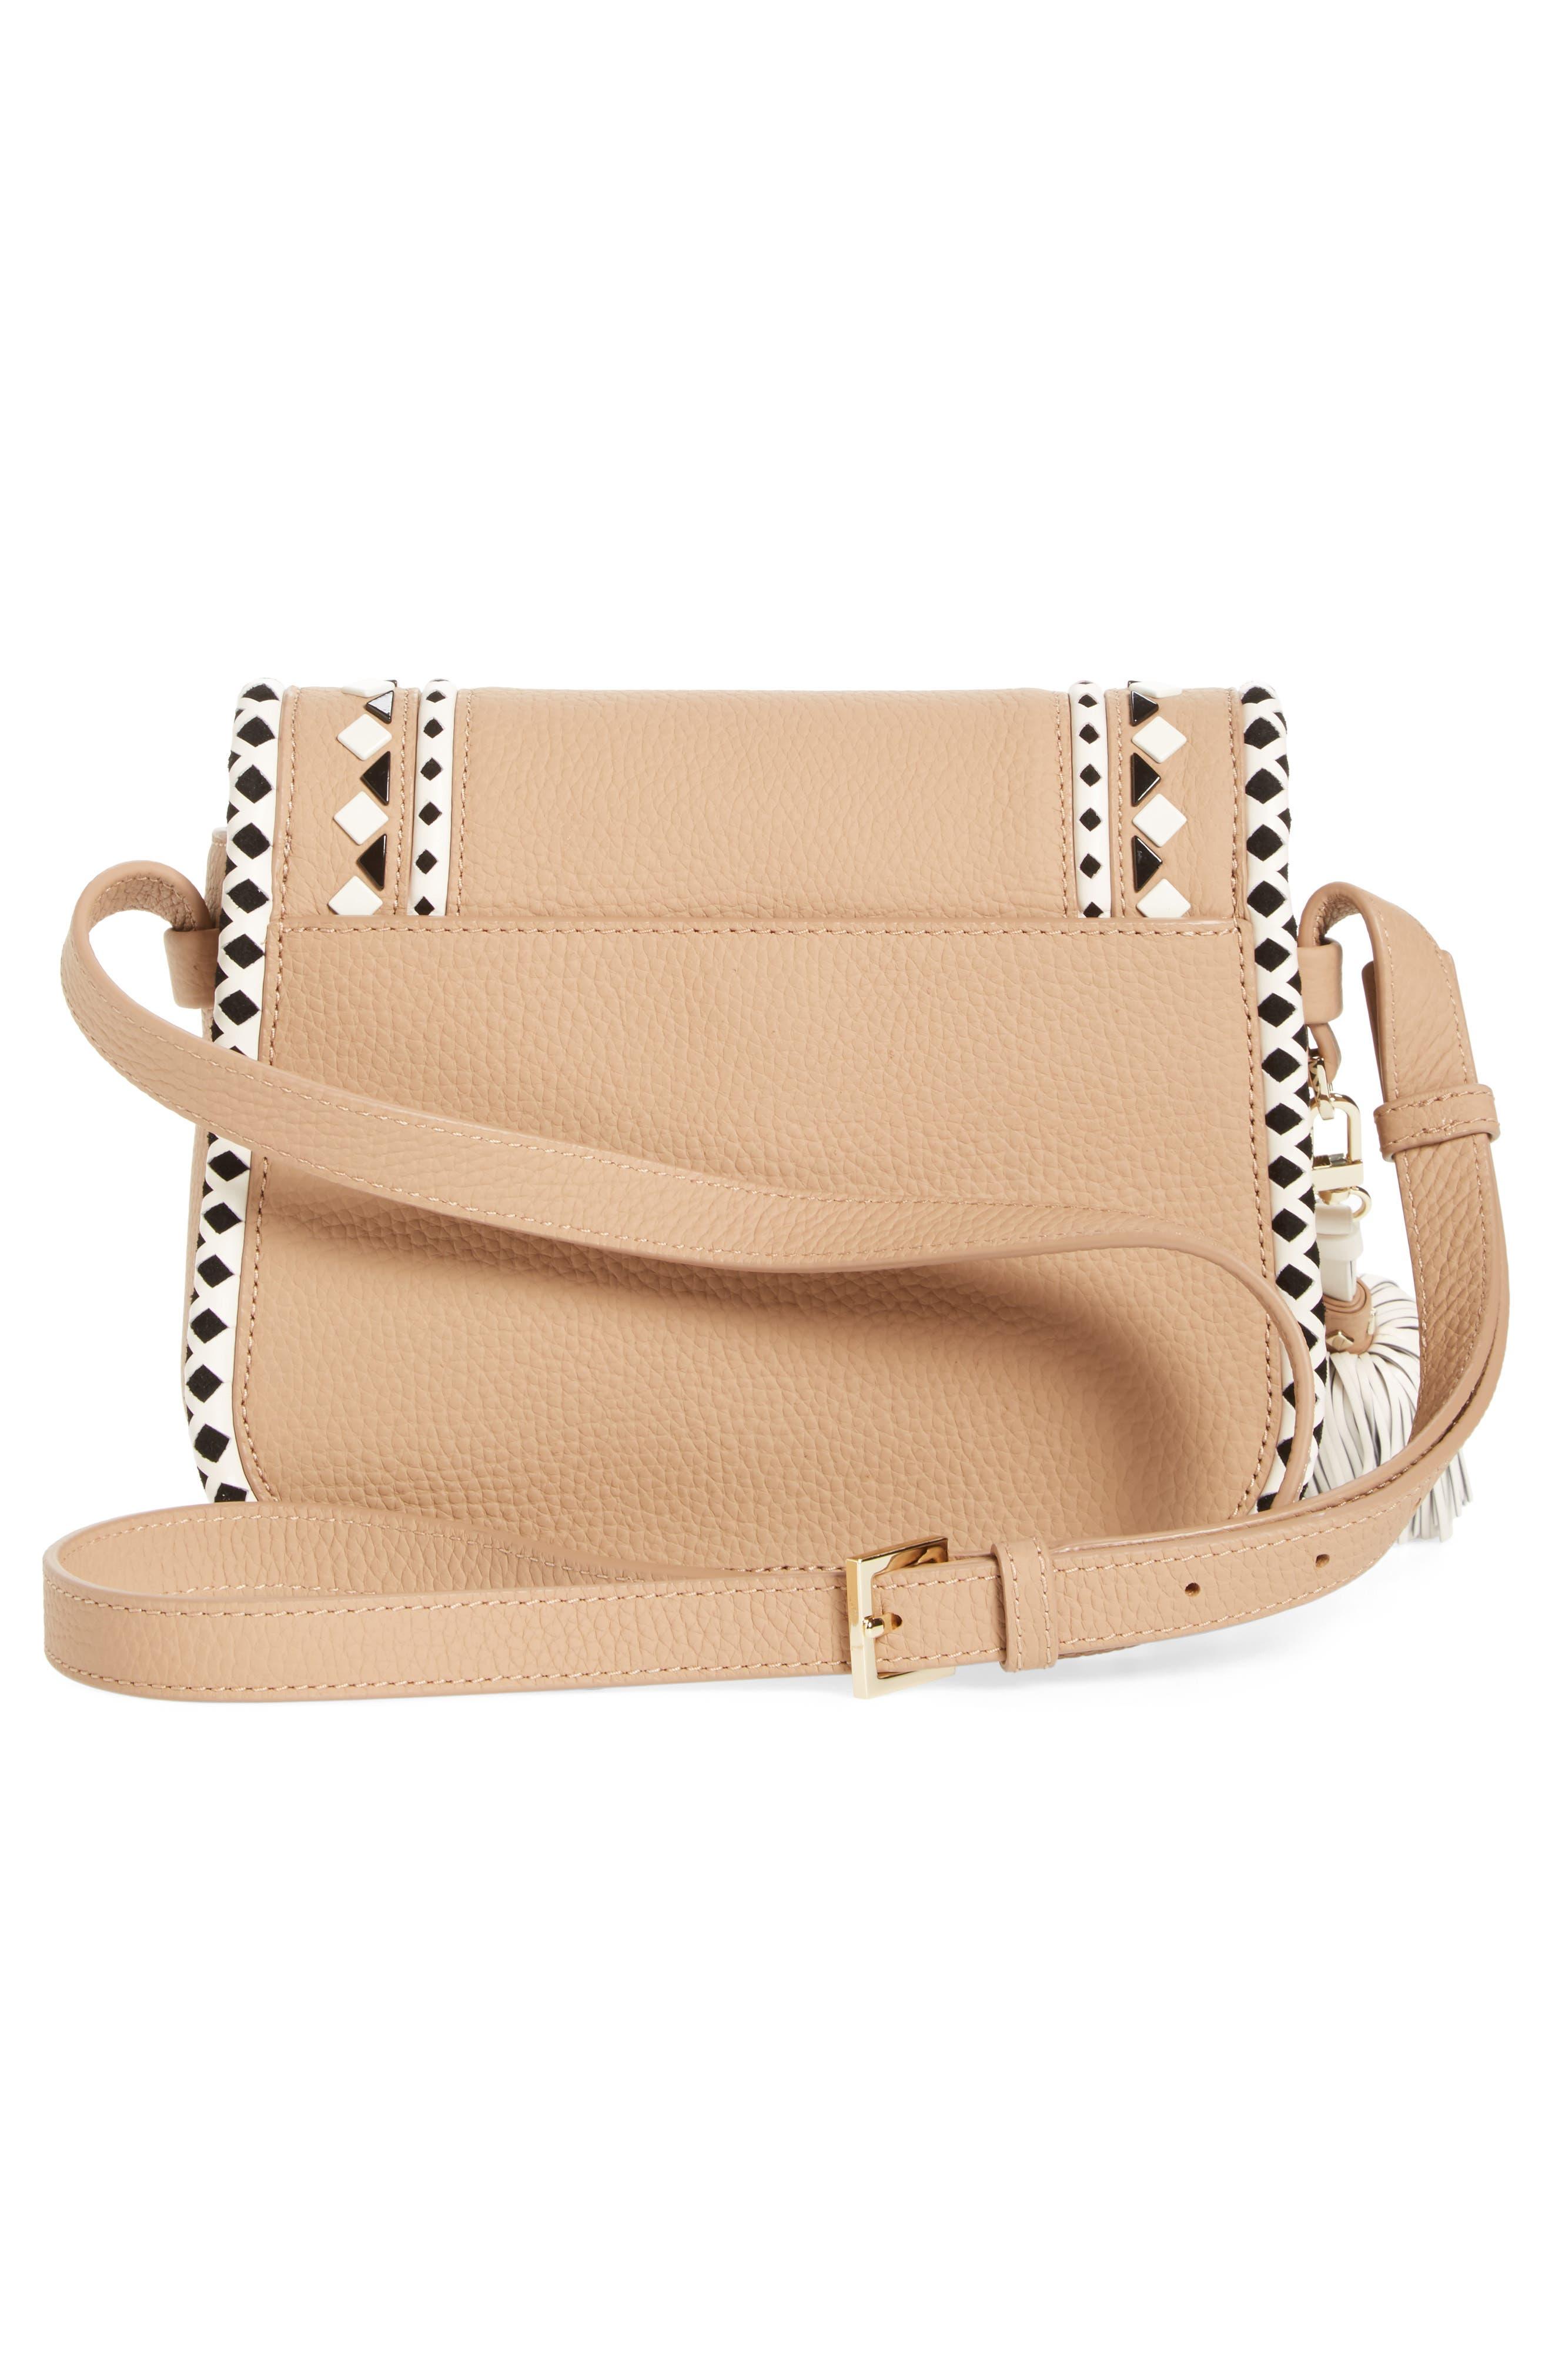 crown street - jasper leather saddle bag,                             Alternate thumbnail 3, color,                             248